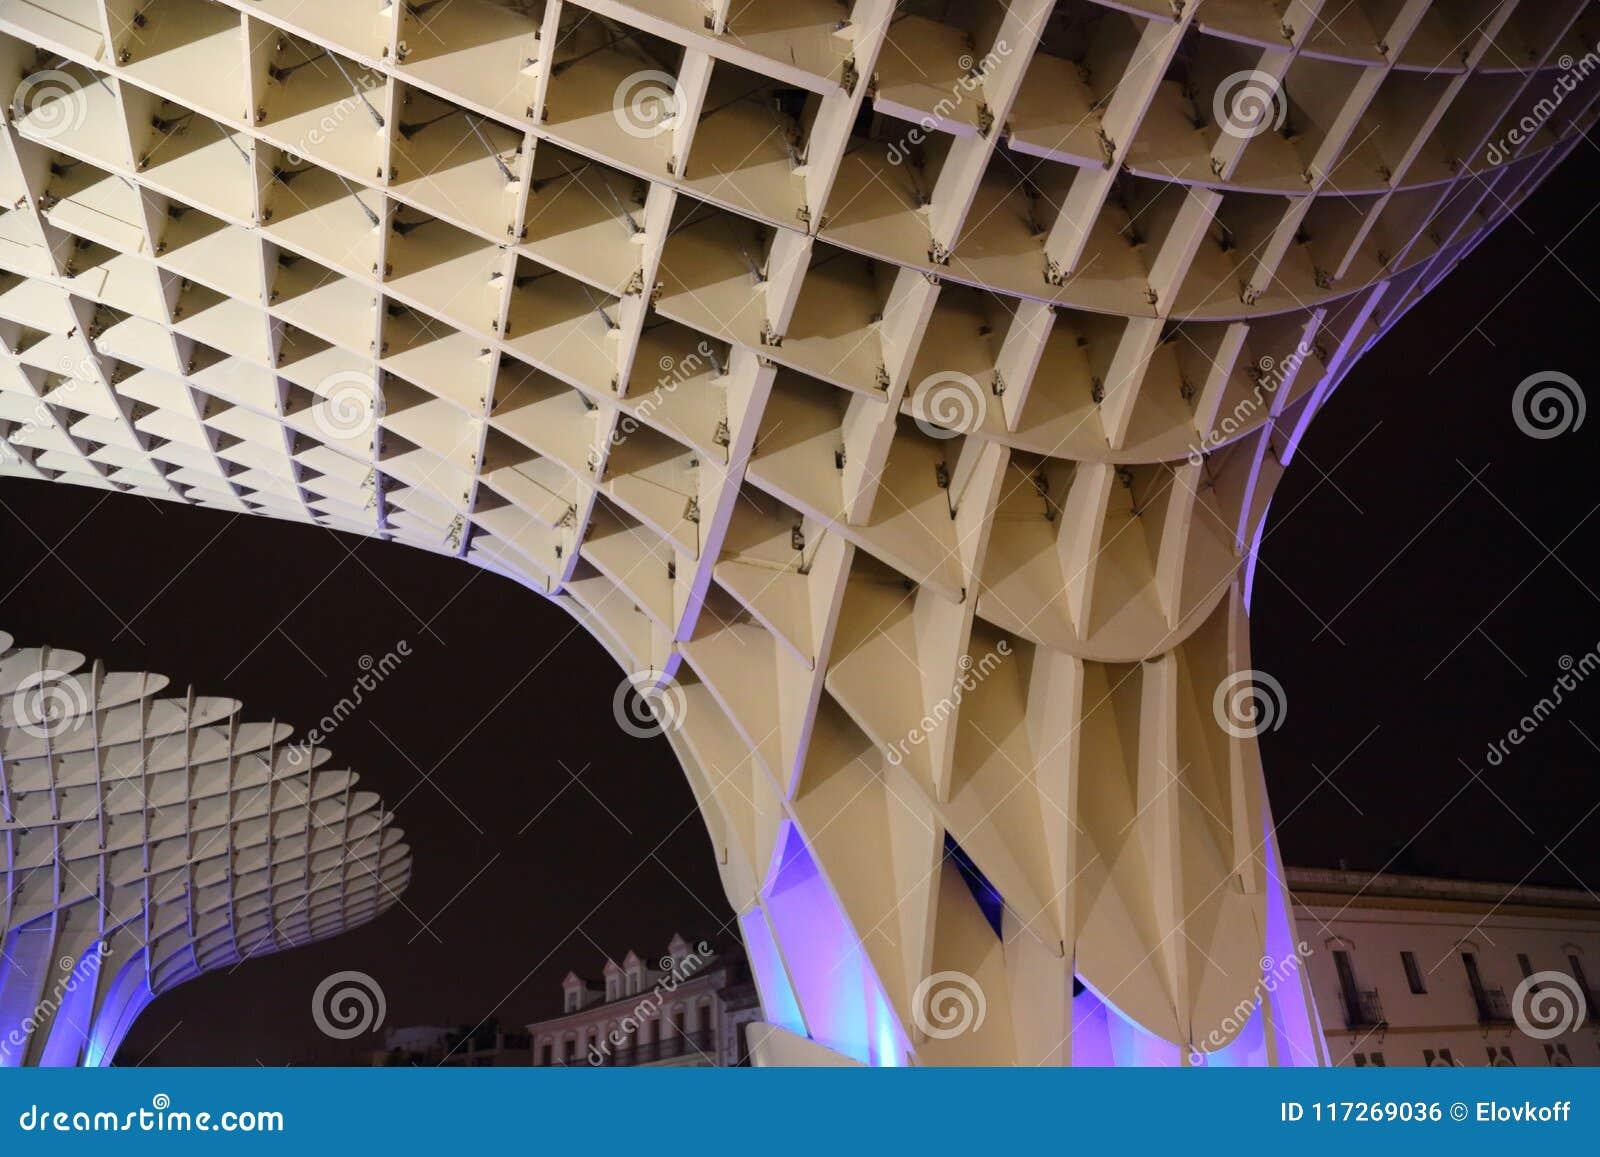 Metropol-Sonnenschirm in Plaza de la Encarnacion, die größte hölzerne Struktur in Europa